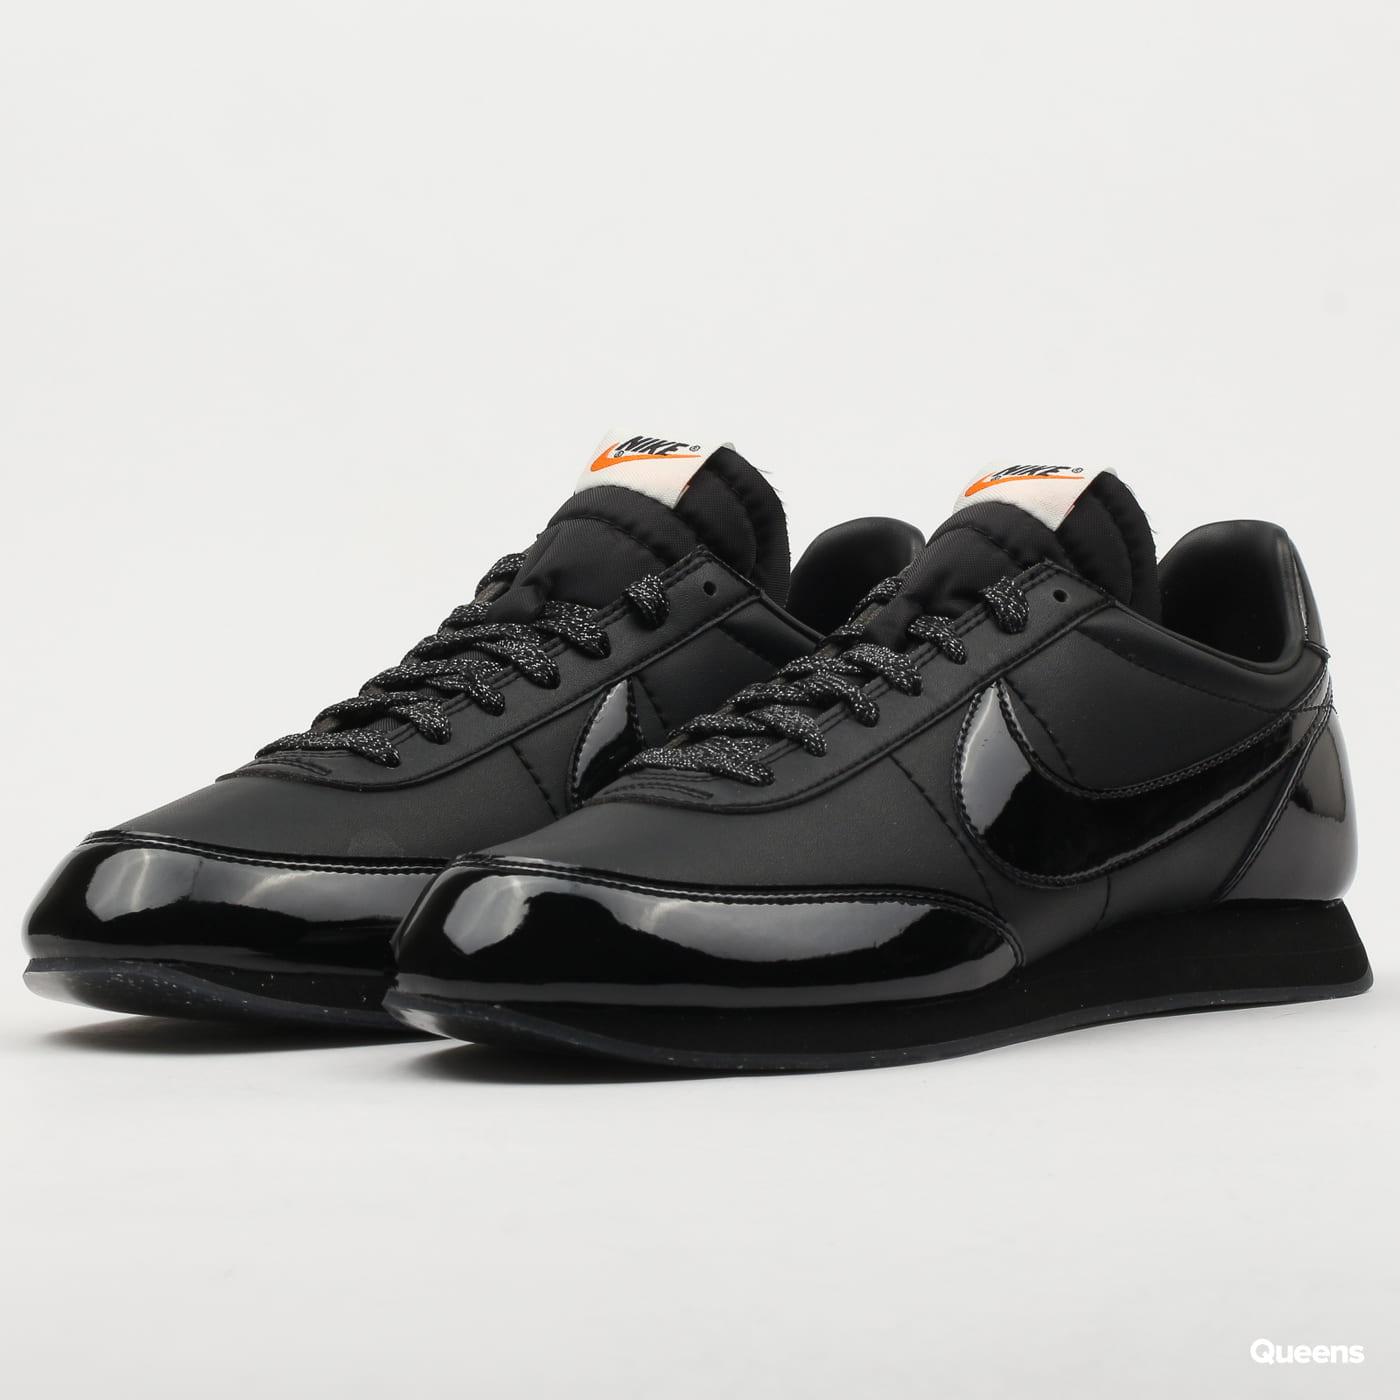 9b1ee46aea4 Boty Nike Nighttrack   CDG (AQ3695-001) – Queens 💚